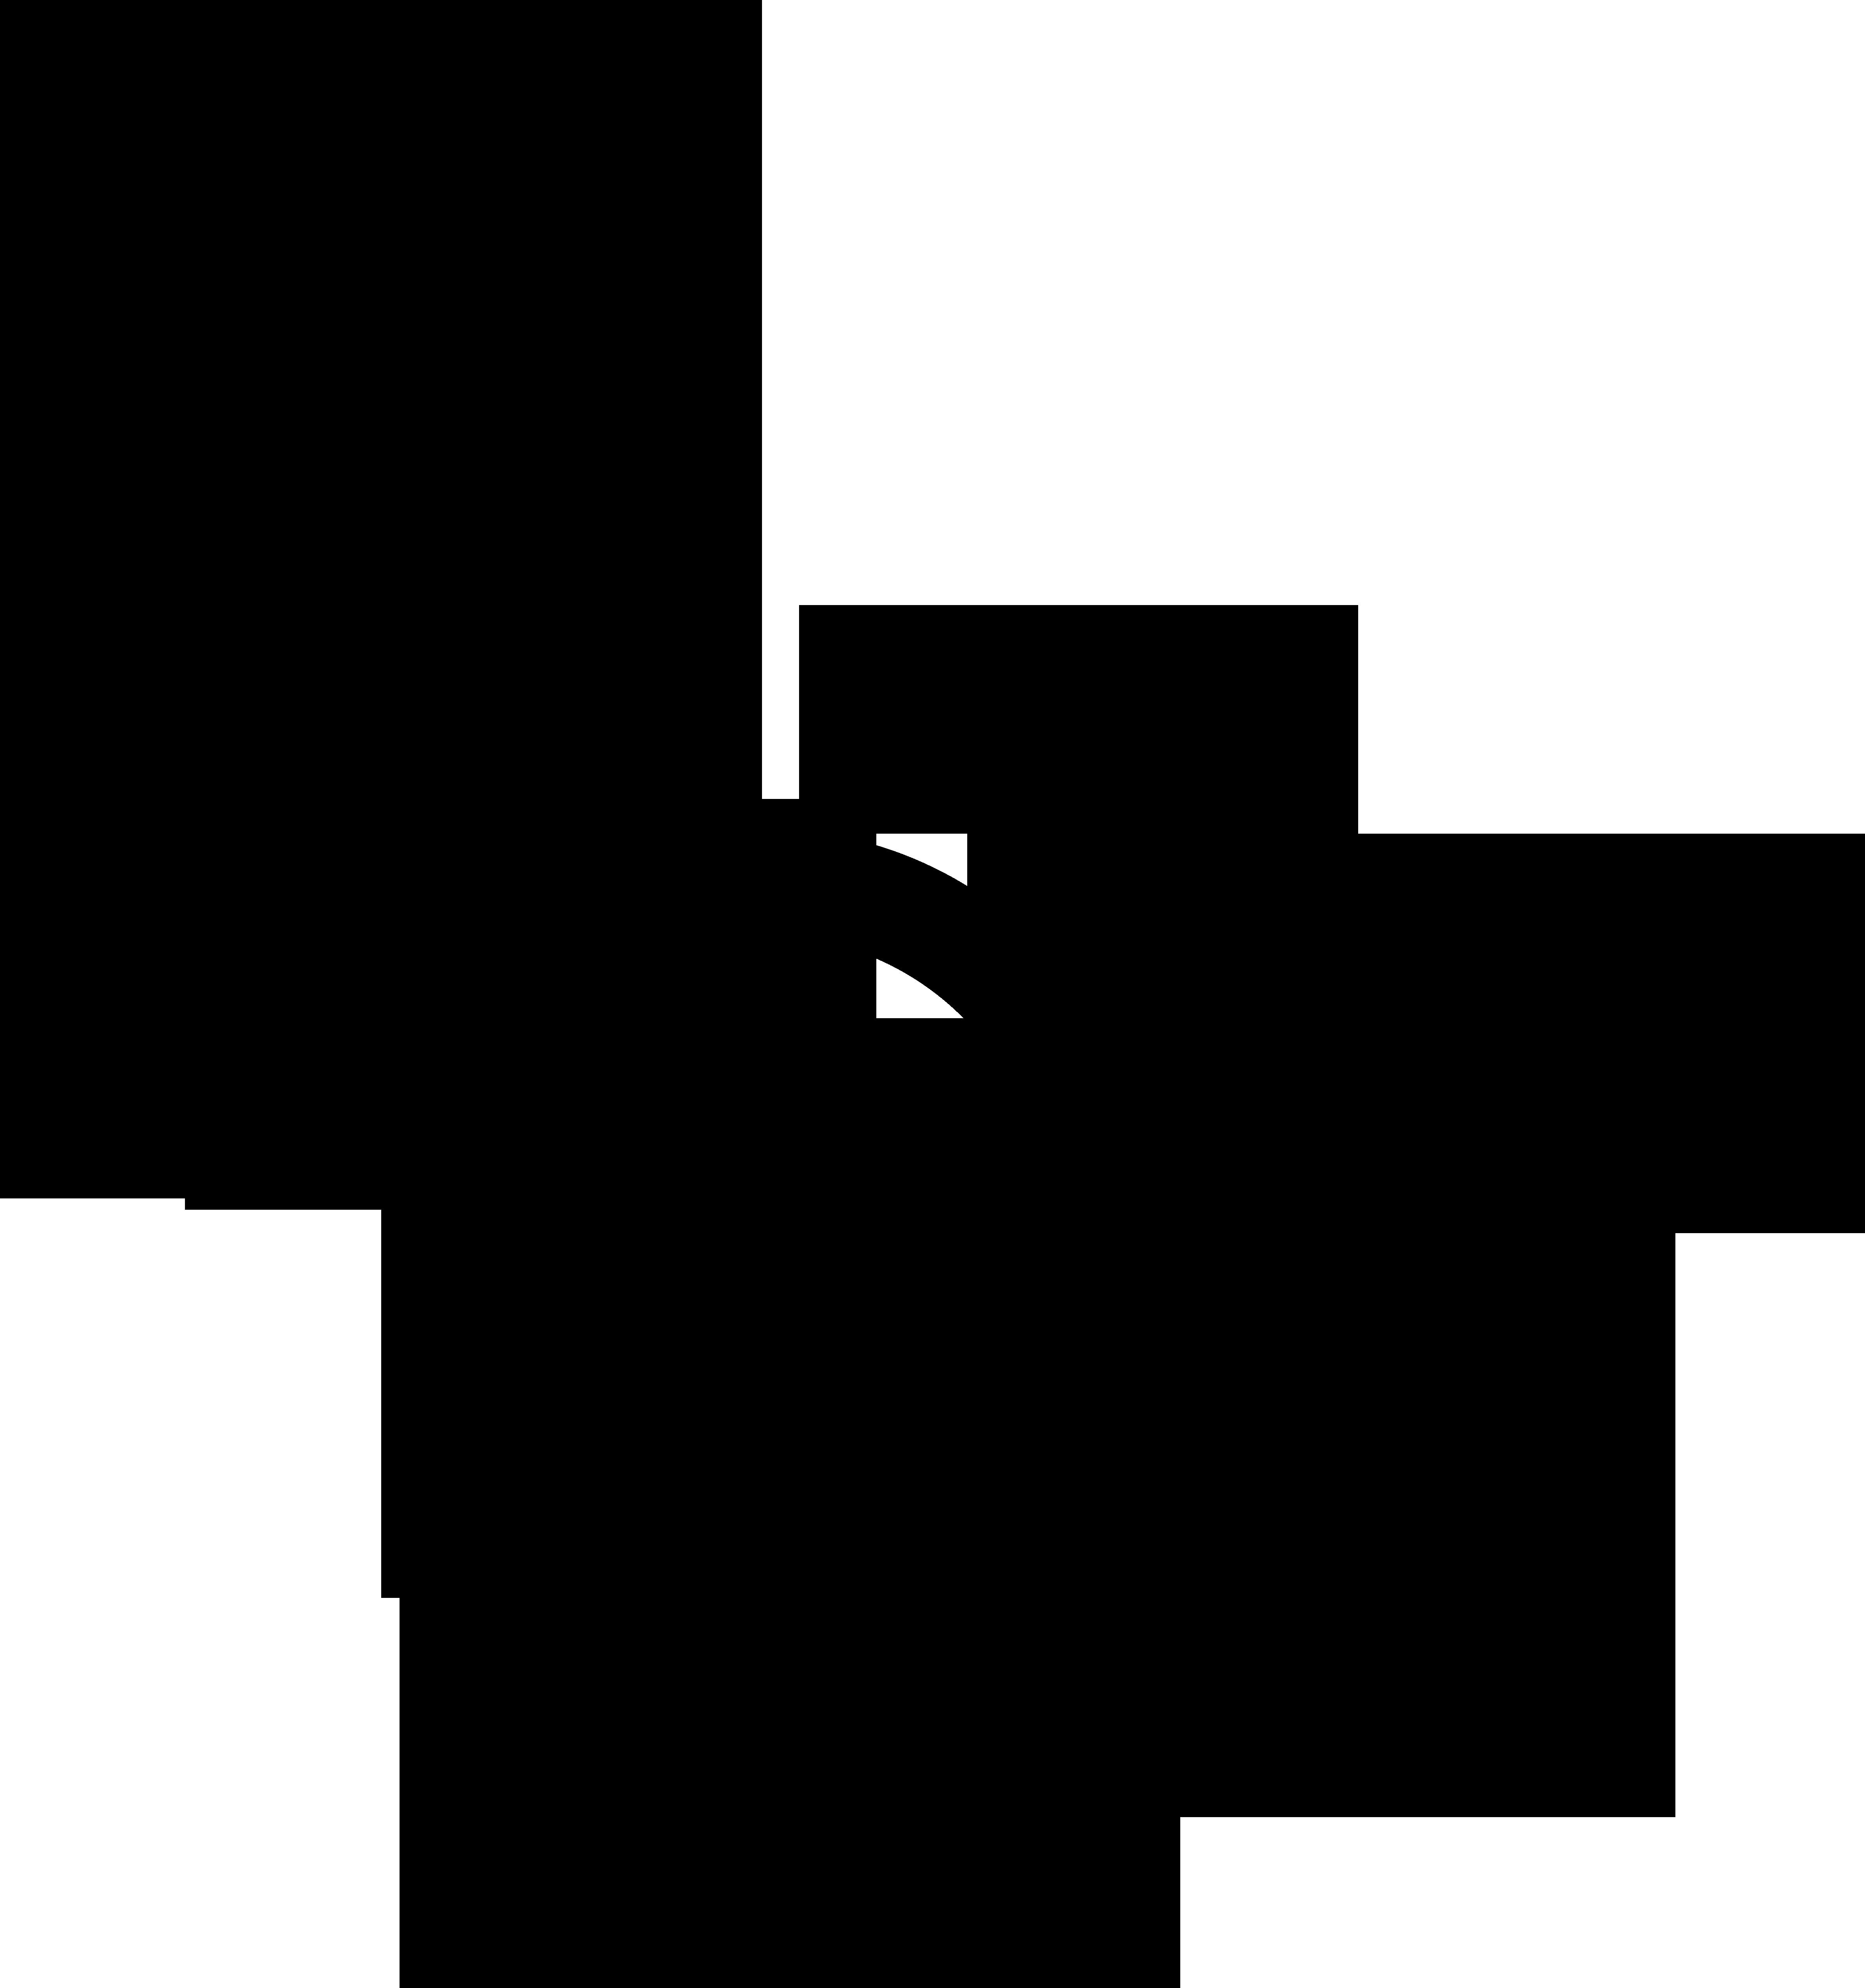 Nonbinary man and woman symbol interlocked with a nonbinary symbol and a Mars symbol.